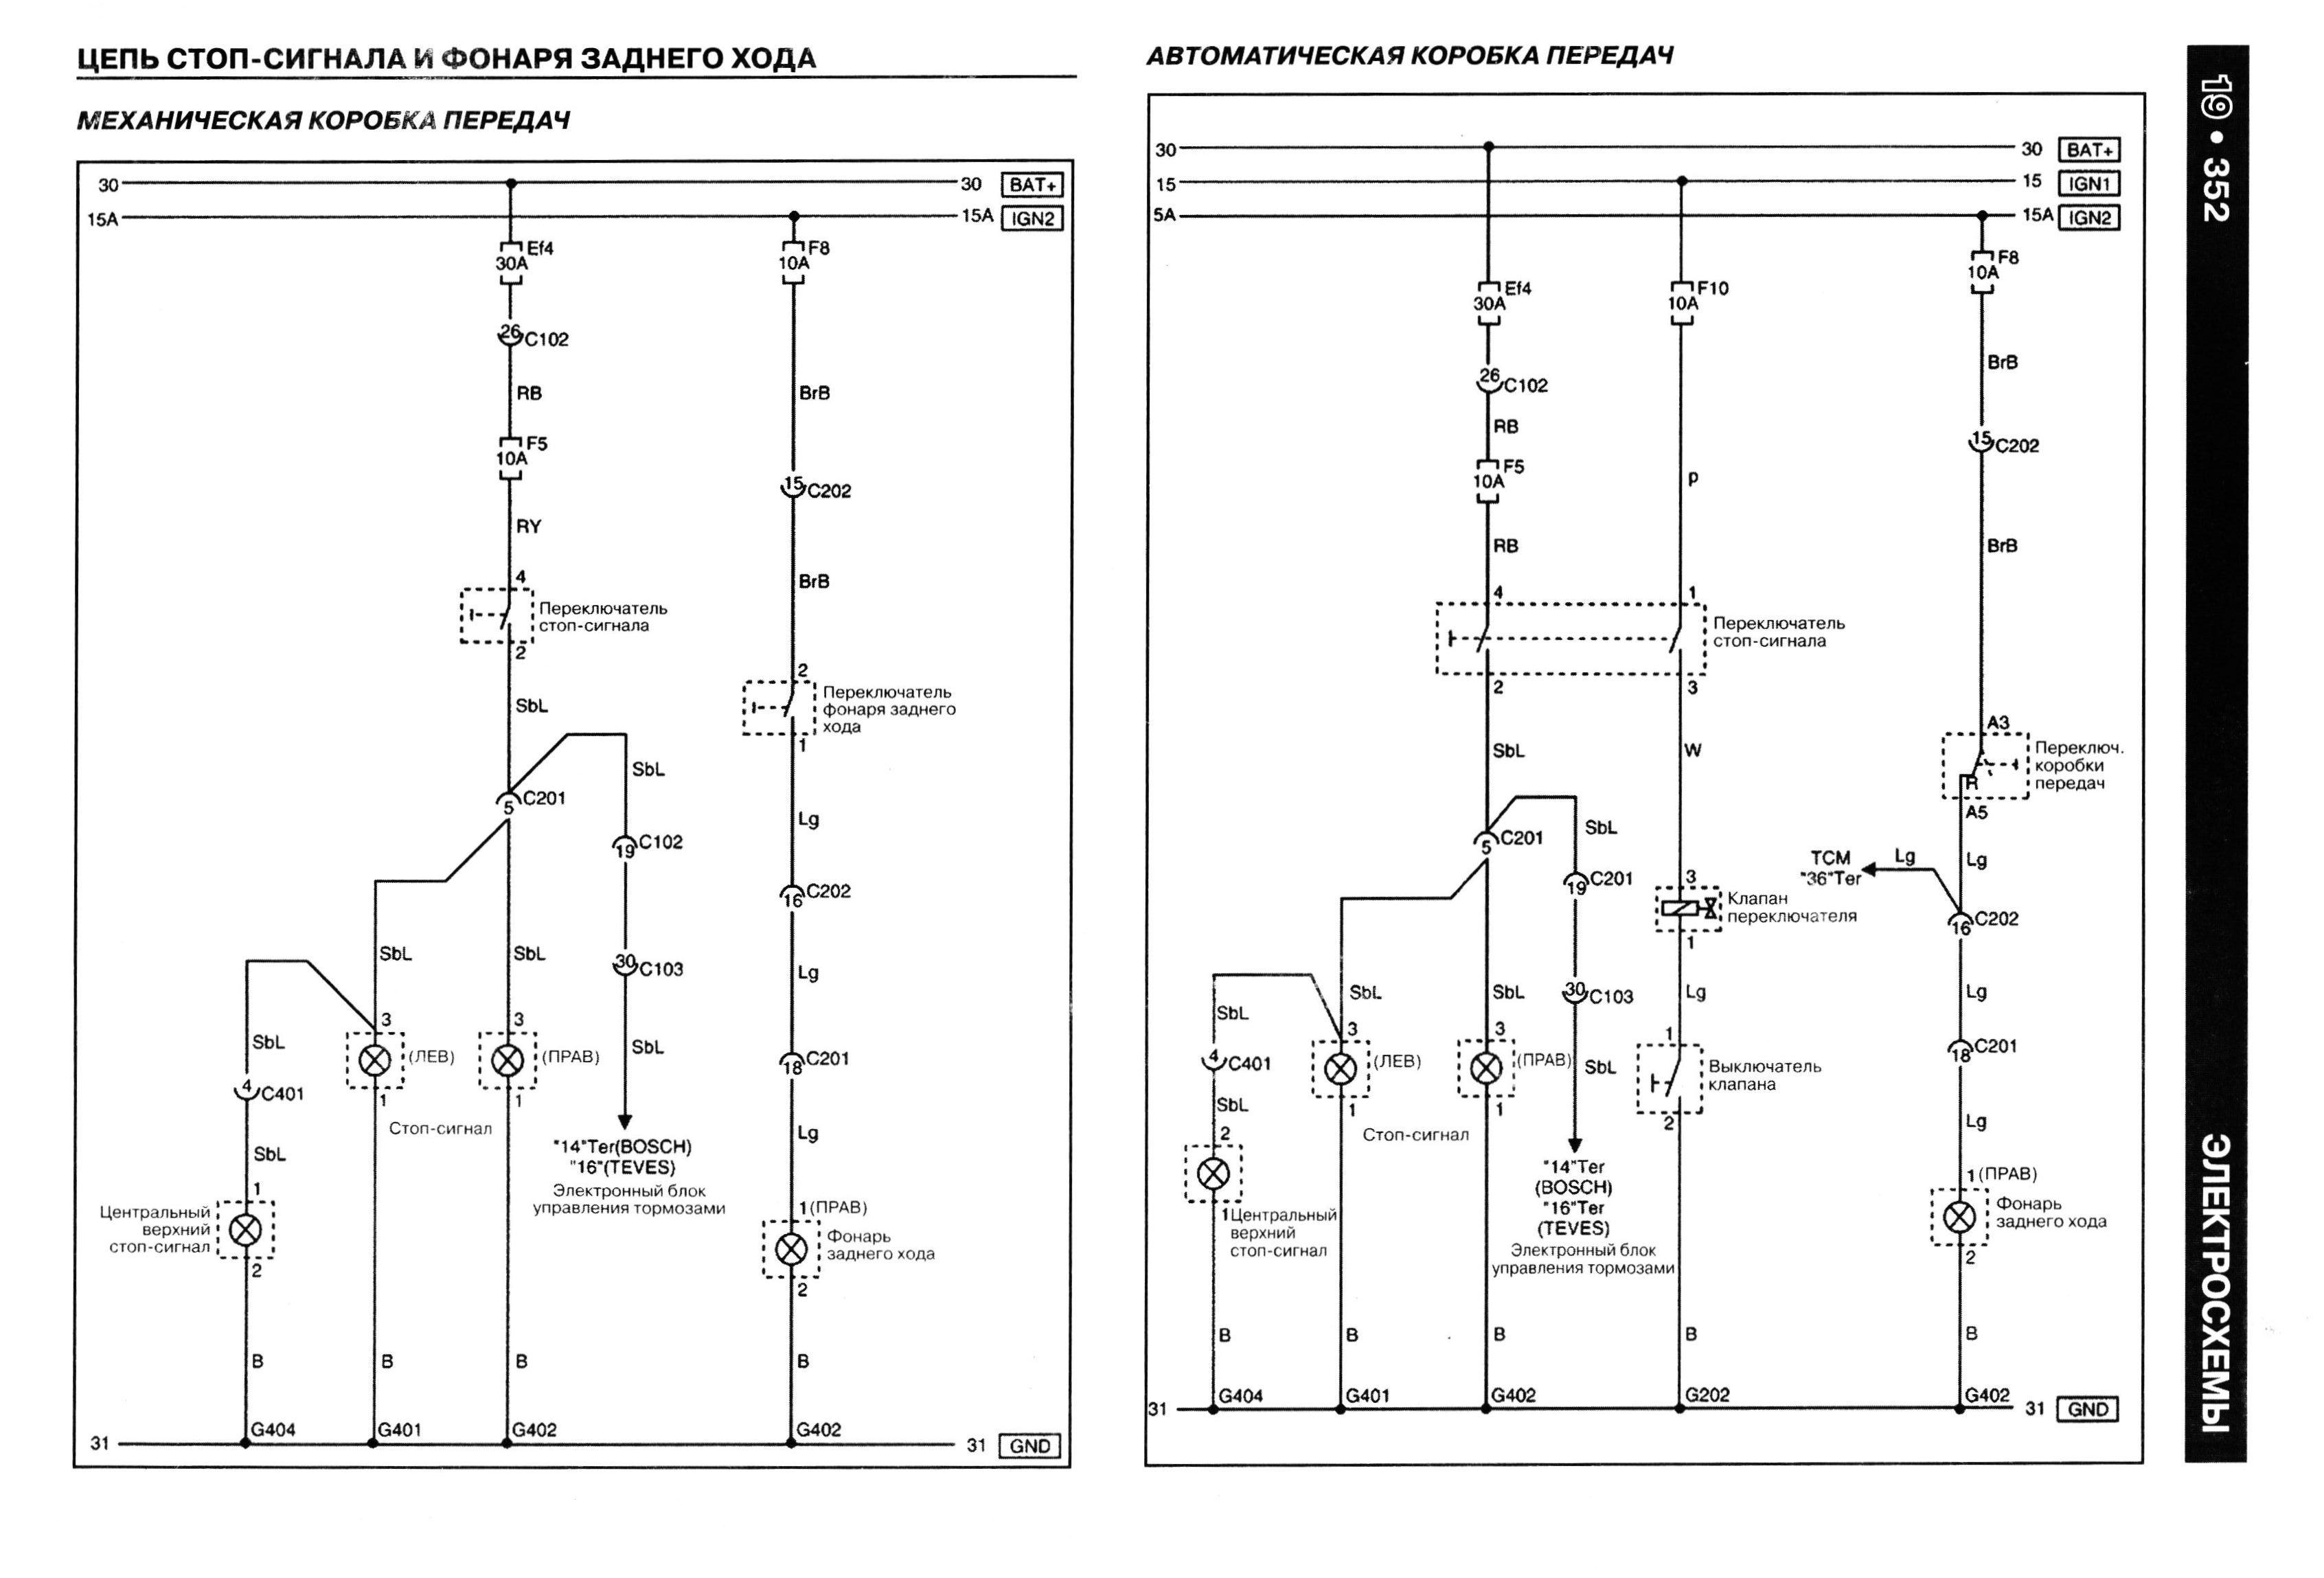 Книга по ремонту и эксплуатации шевроле спарк м300